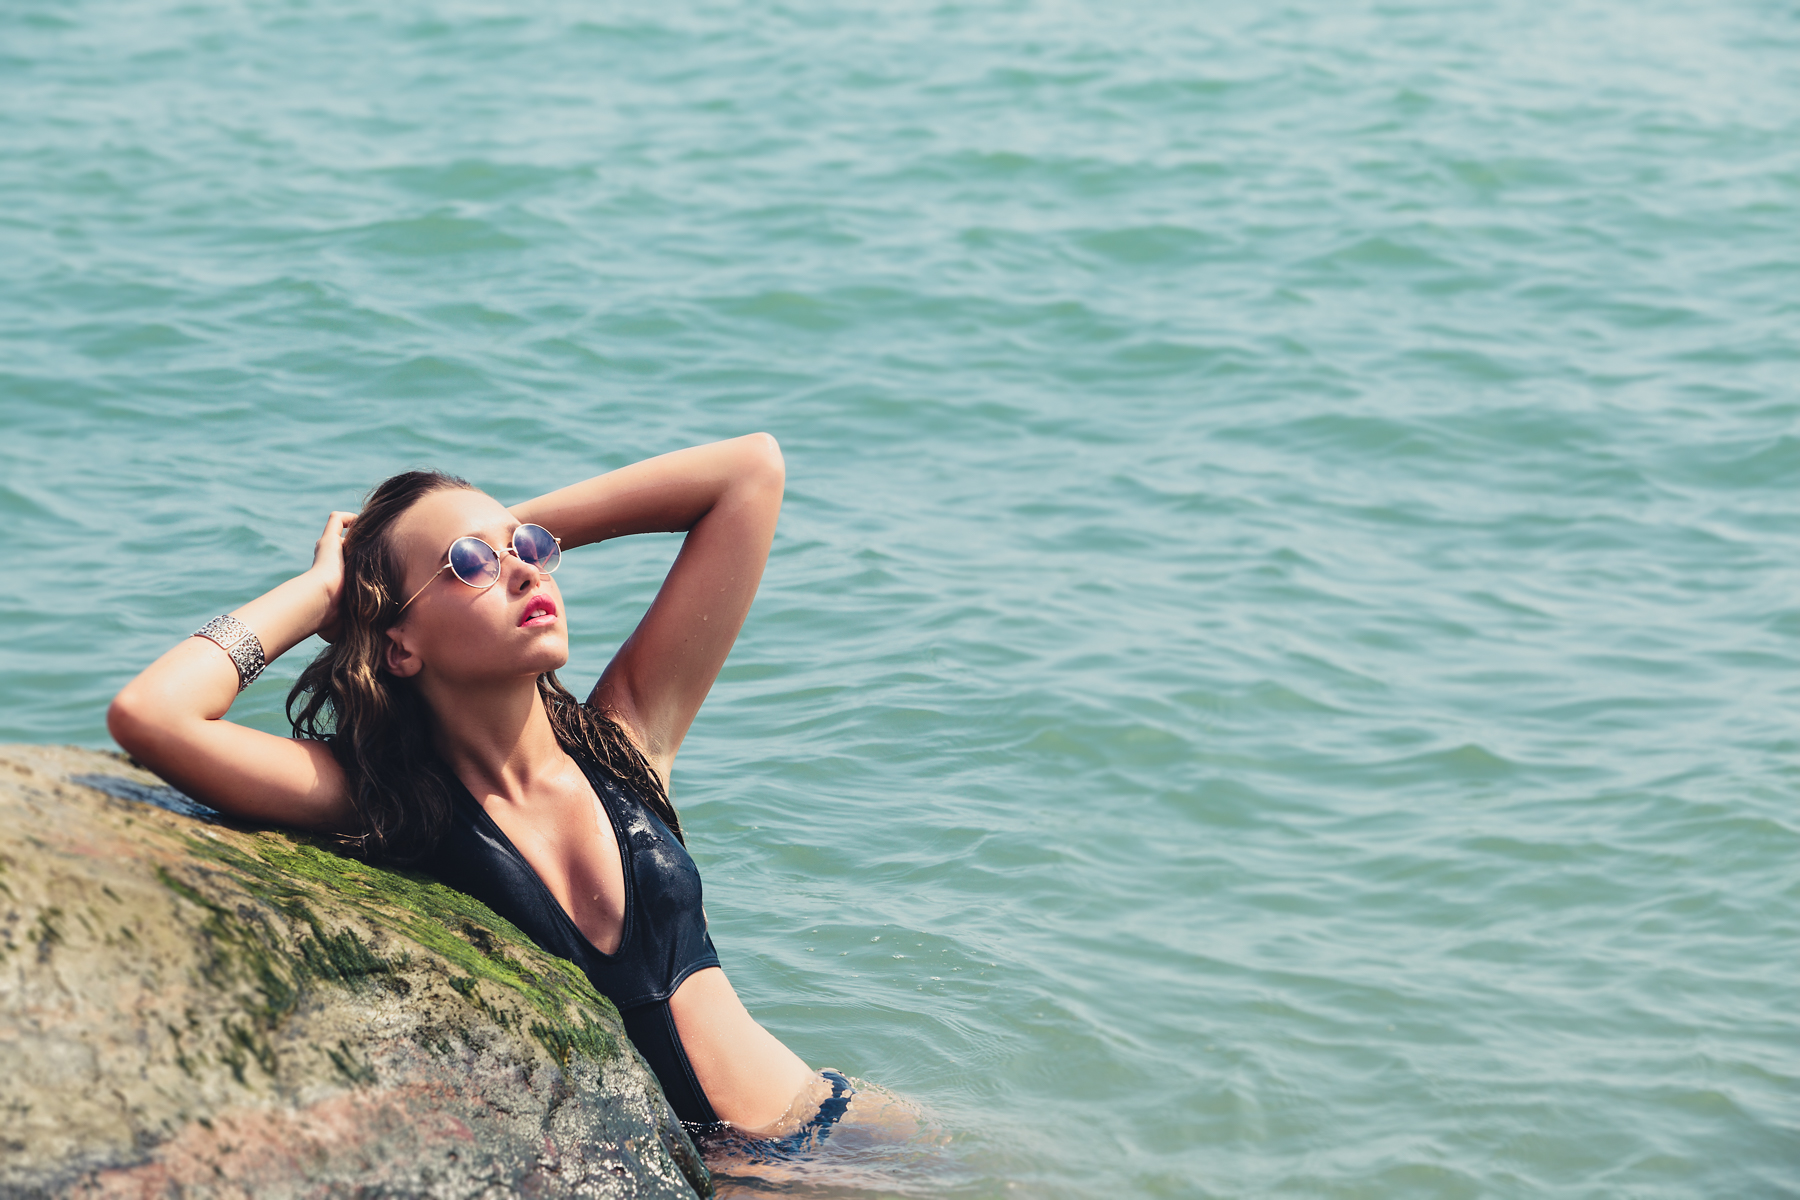 Girl in sunglasses in the sea